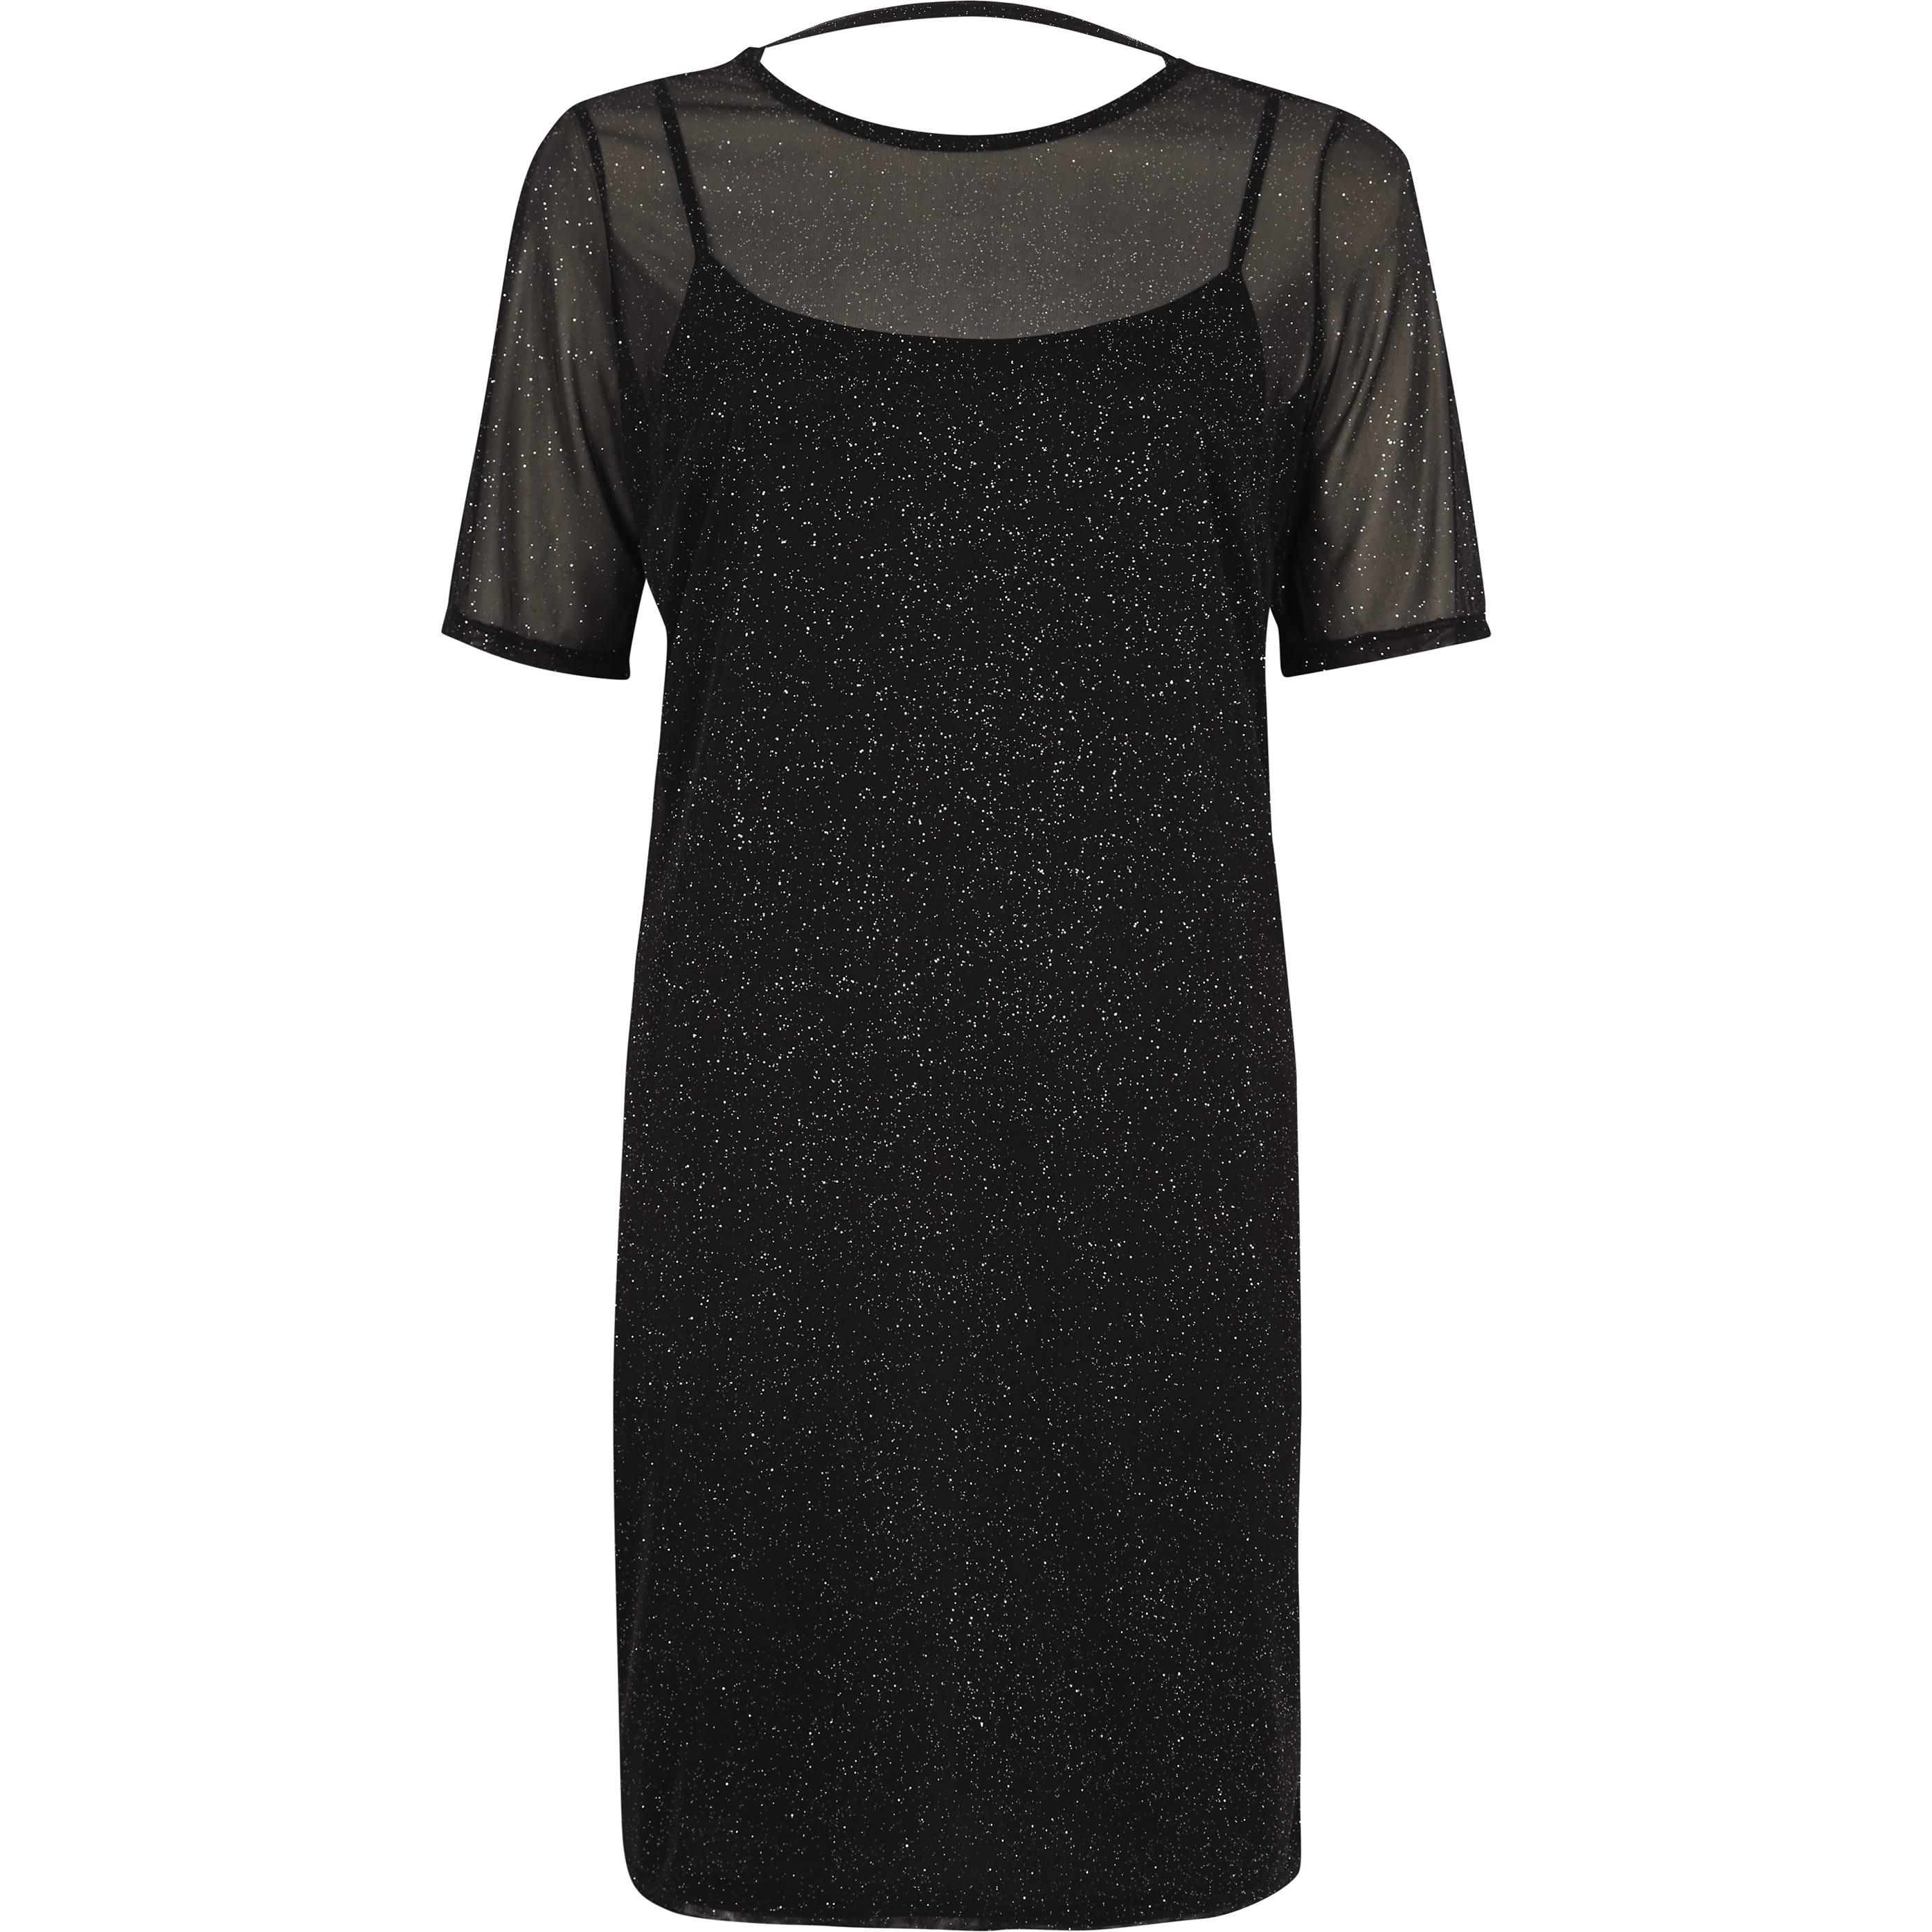 River Island Womens Black glitter mesh T-shirt dress (6)